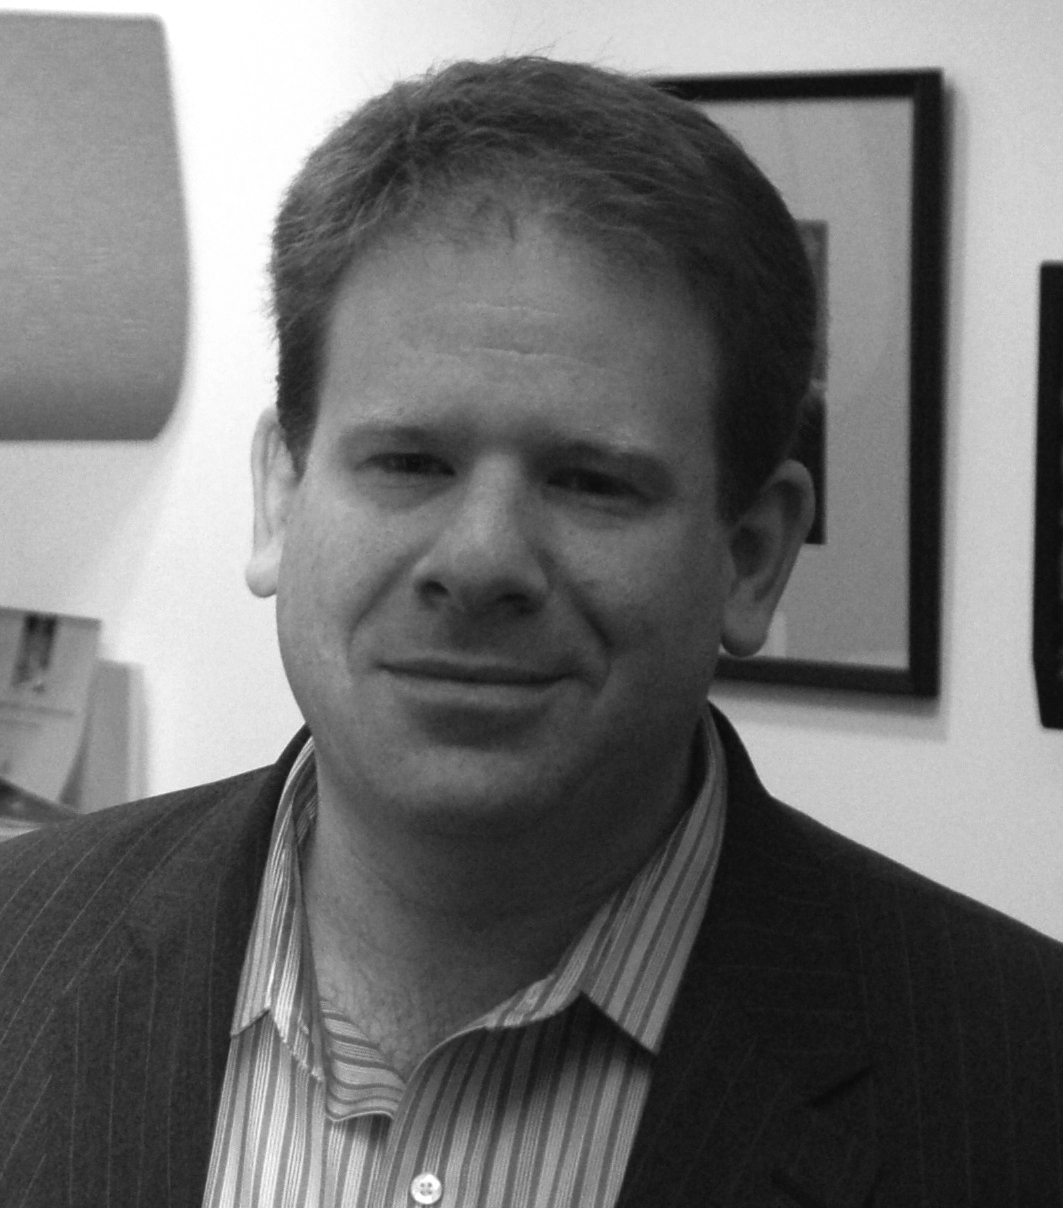 Andrew Goldberg